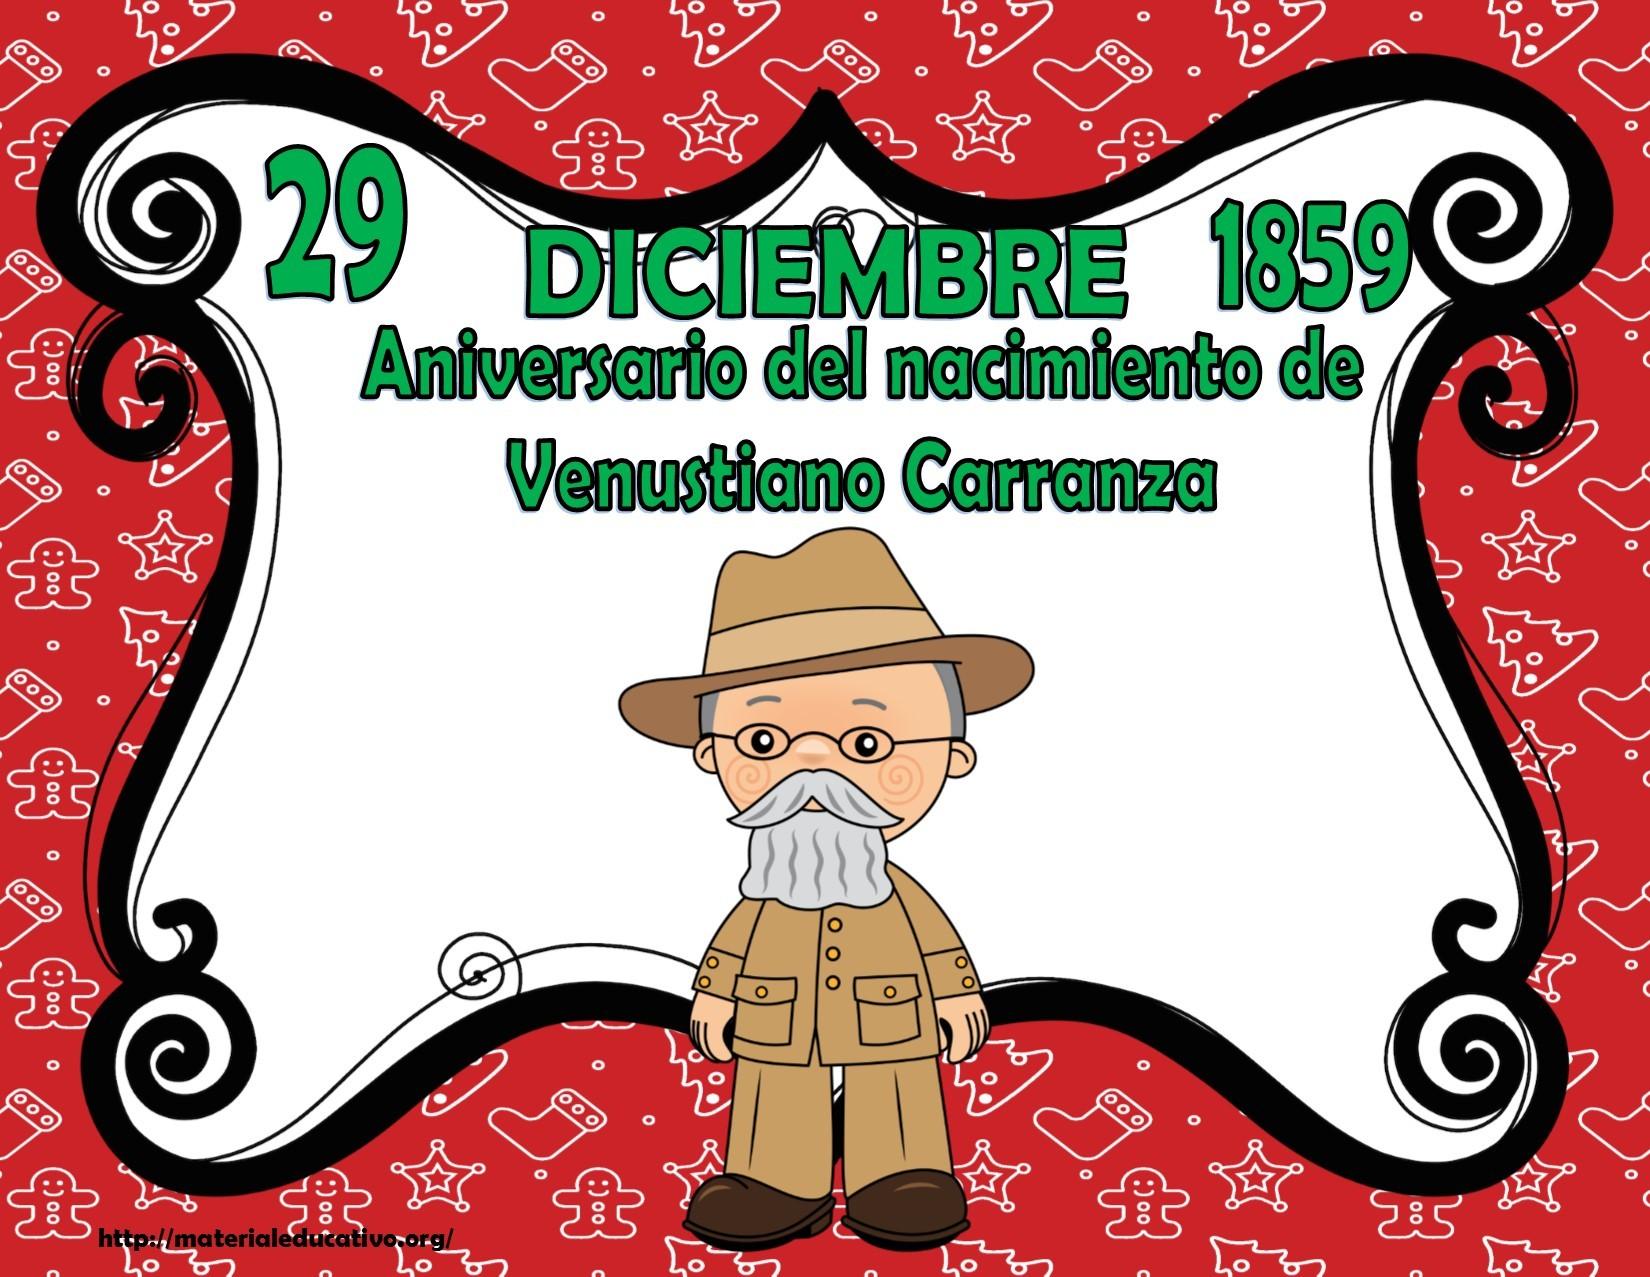 Calendario Escolar 2018-2019 Mexico Septiembre Más Arriba-a-fecha Efemérides Del Mes De Diciembre Estupendos Dise±os Of Calendario Escolar 2018-2019 Mexico Septiembre Más Populares 25 Unique Calendario 2015